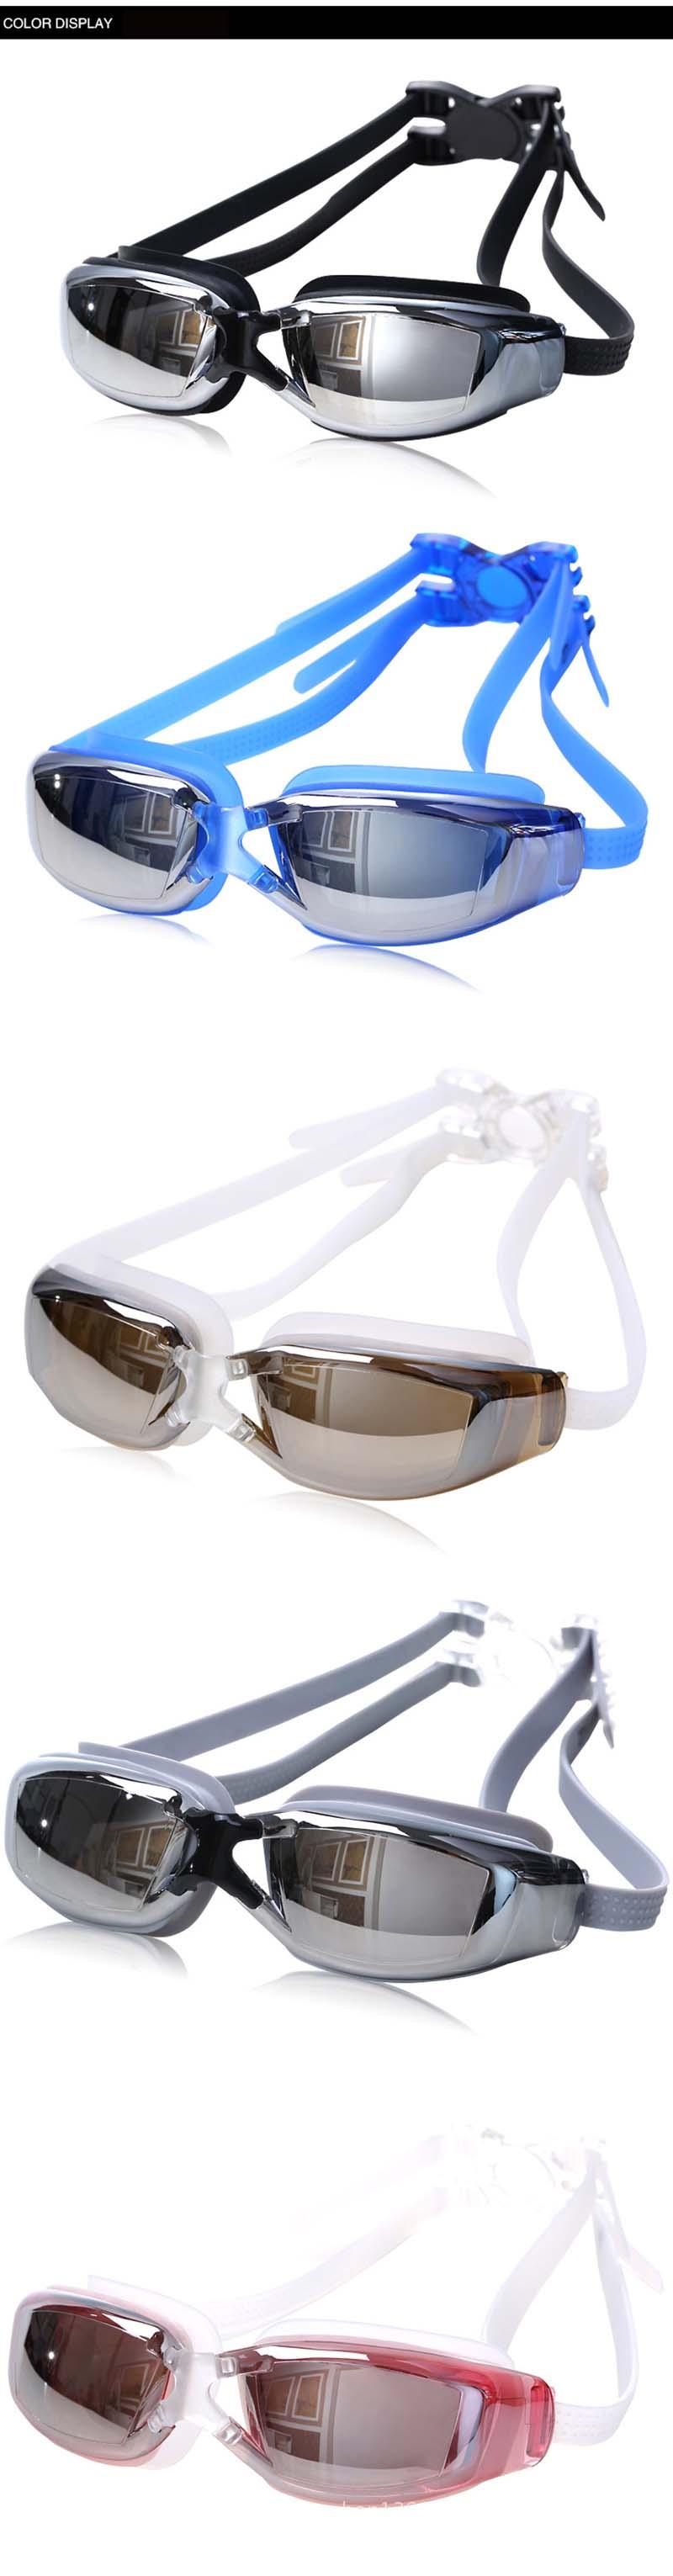 elite professional hd anti-fog swim goggles Elite Professional HD Anti-Fog Swim Goggles HTB1q4UgPFXXXXcUaXXXq6xXFXXXH